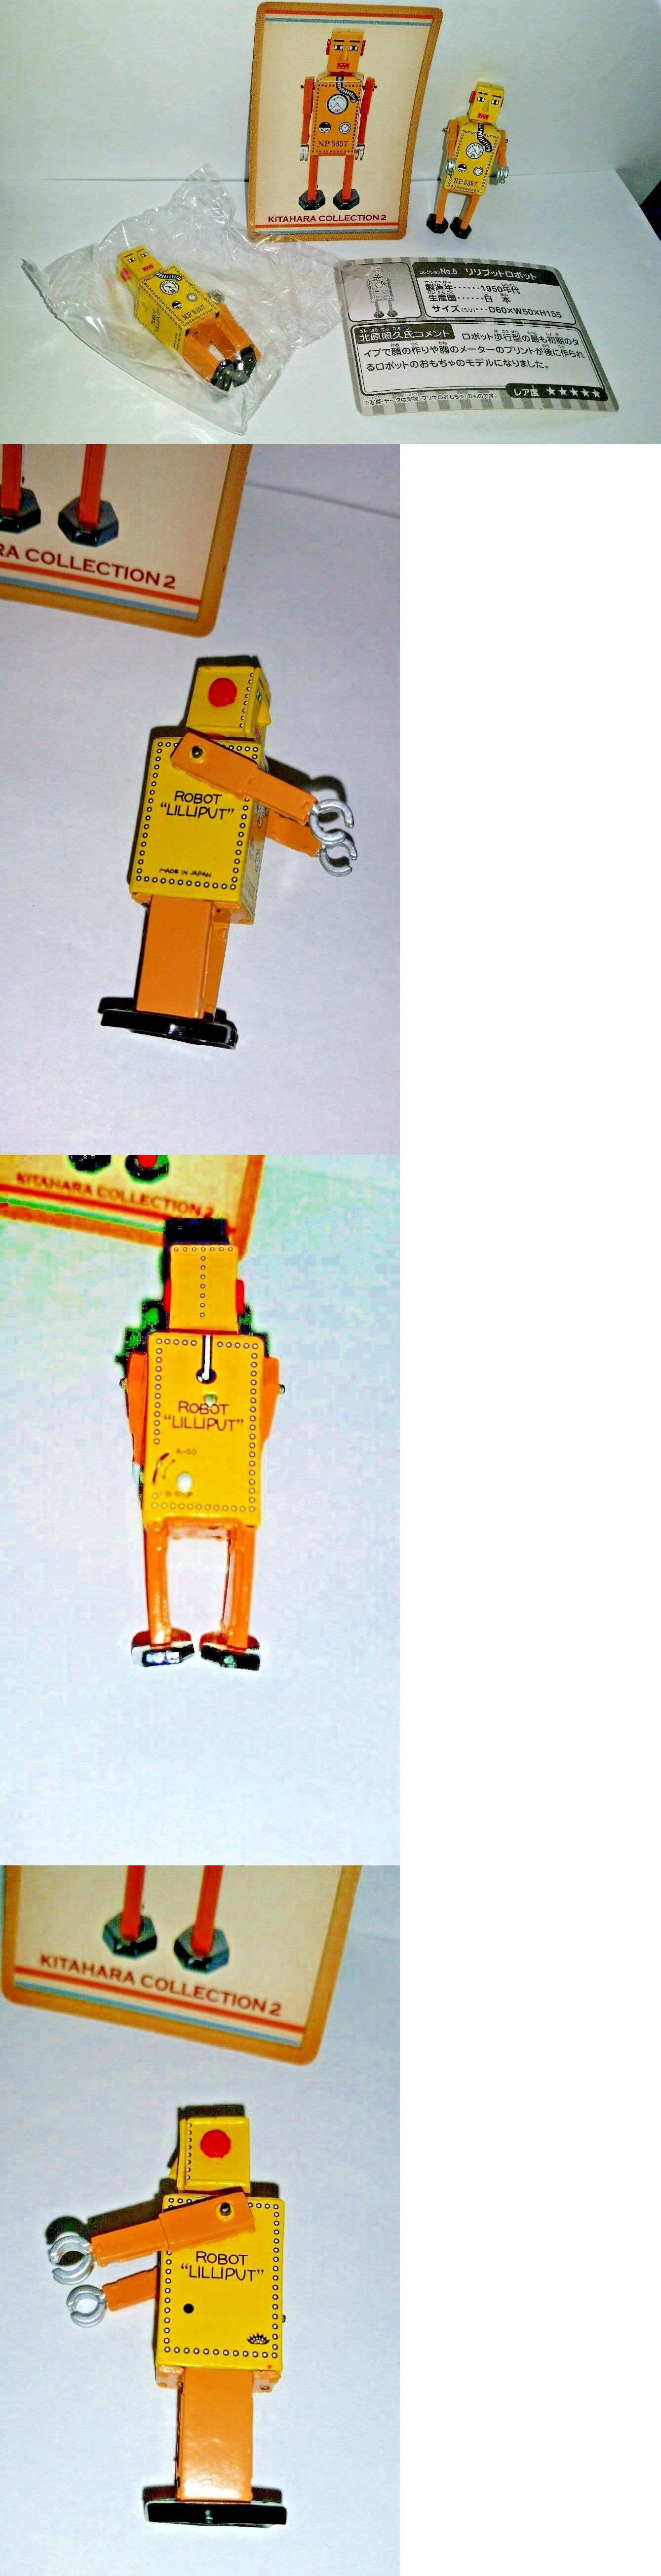 "LILLIPUT ROBOT #5 in /""Kitahara Collection 2/"" Mini VINYL replica Bandai 2003"